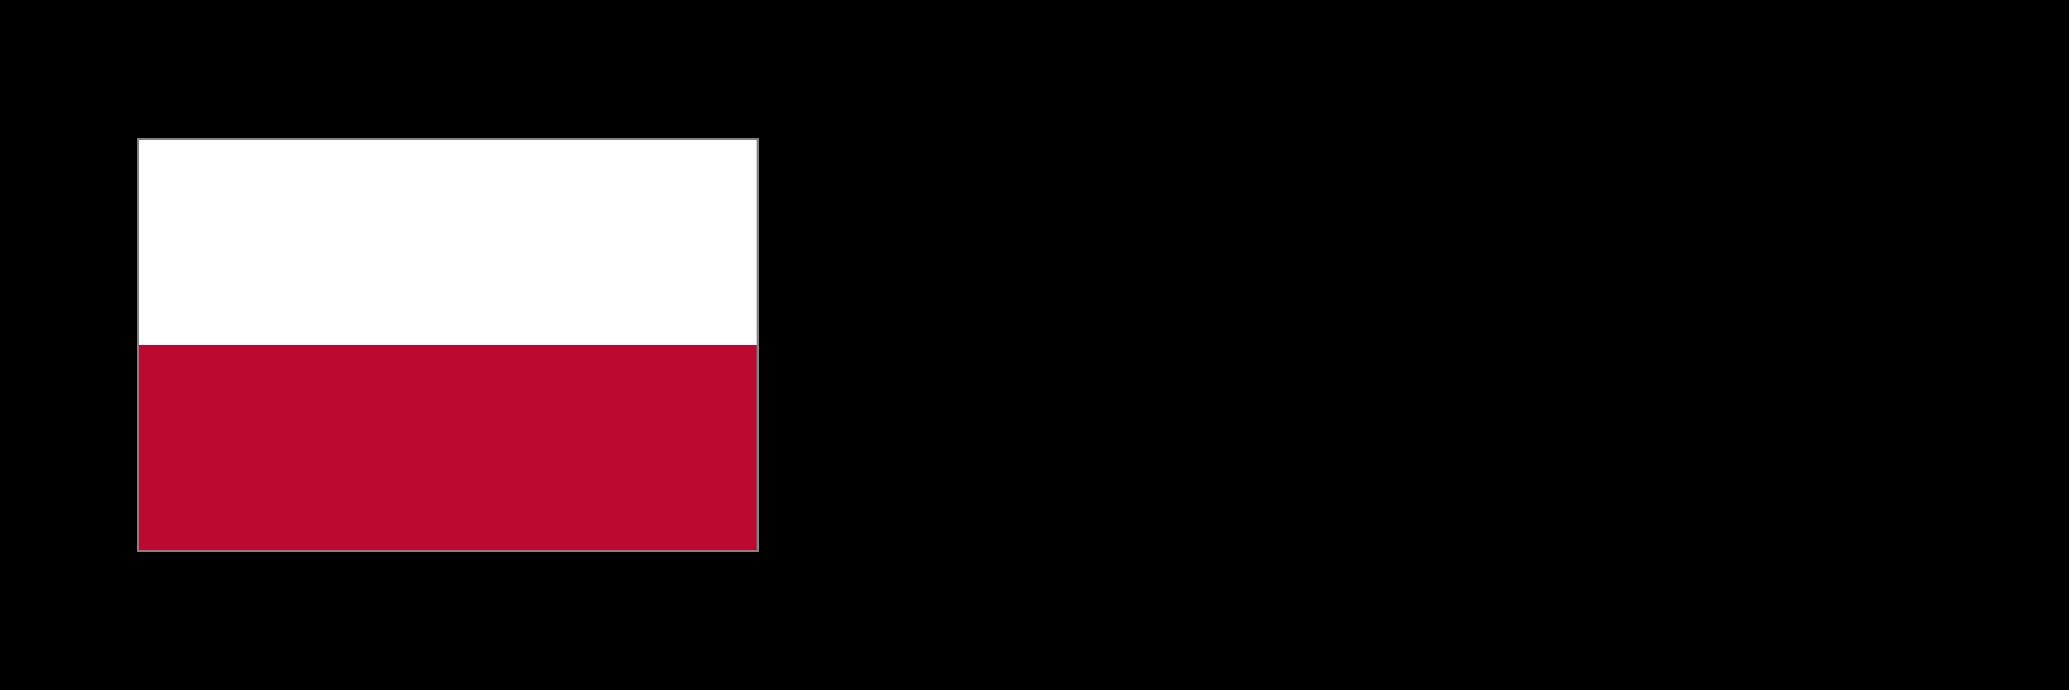 Flaga Polski, obok napis: Rzeczpospolita Polska